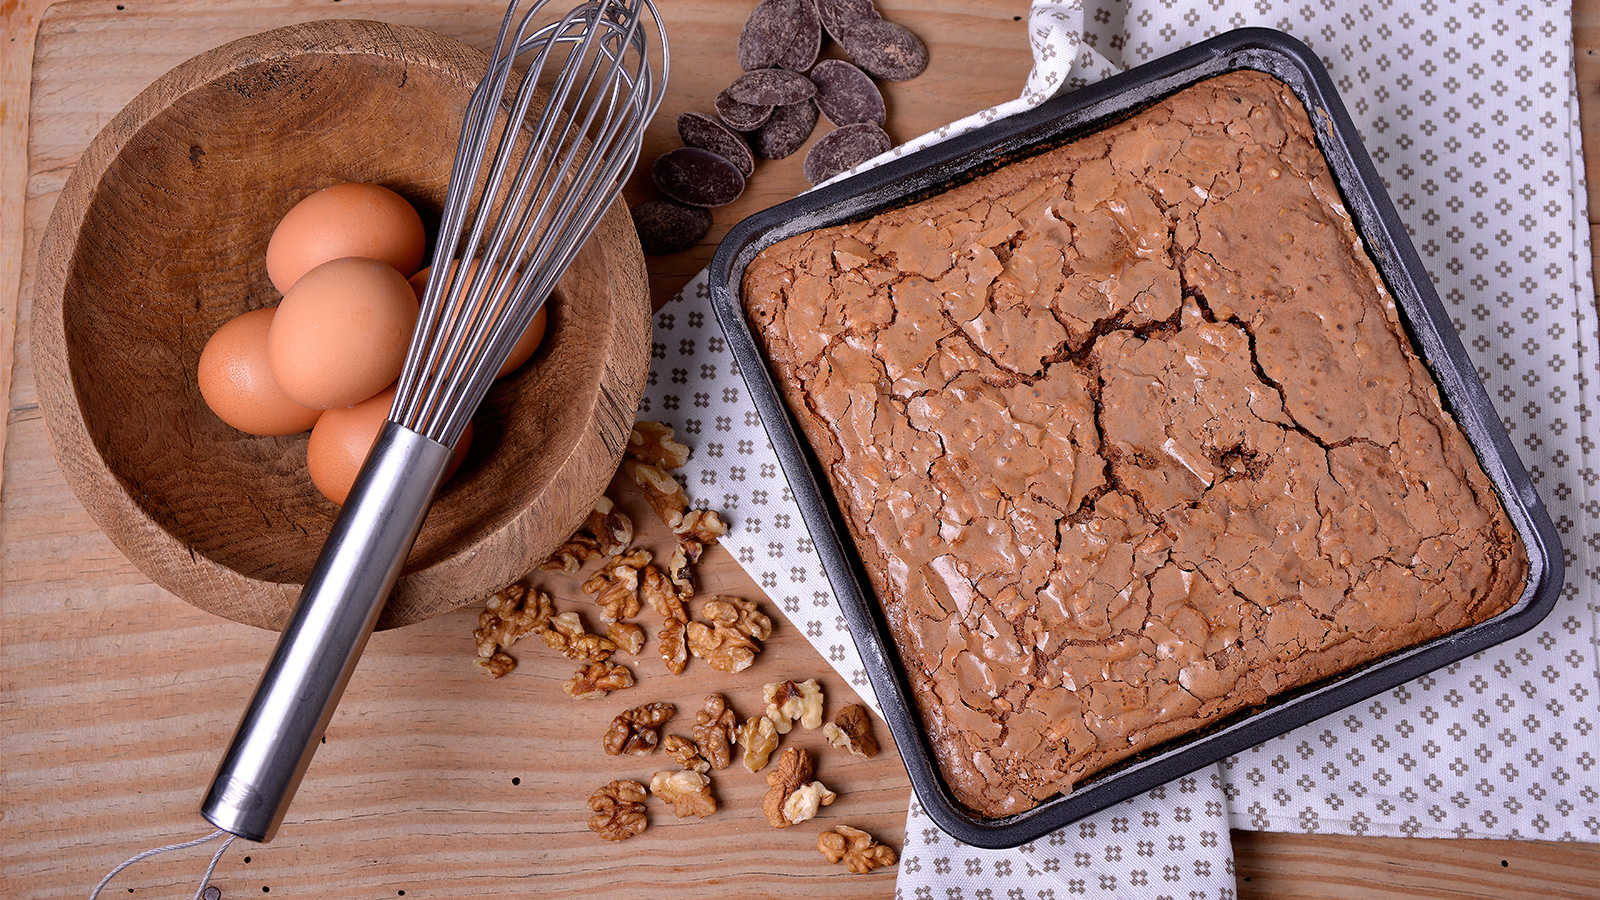 brownie matthew scott receta canal cocina